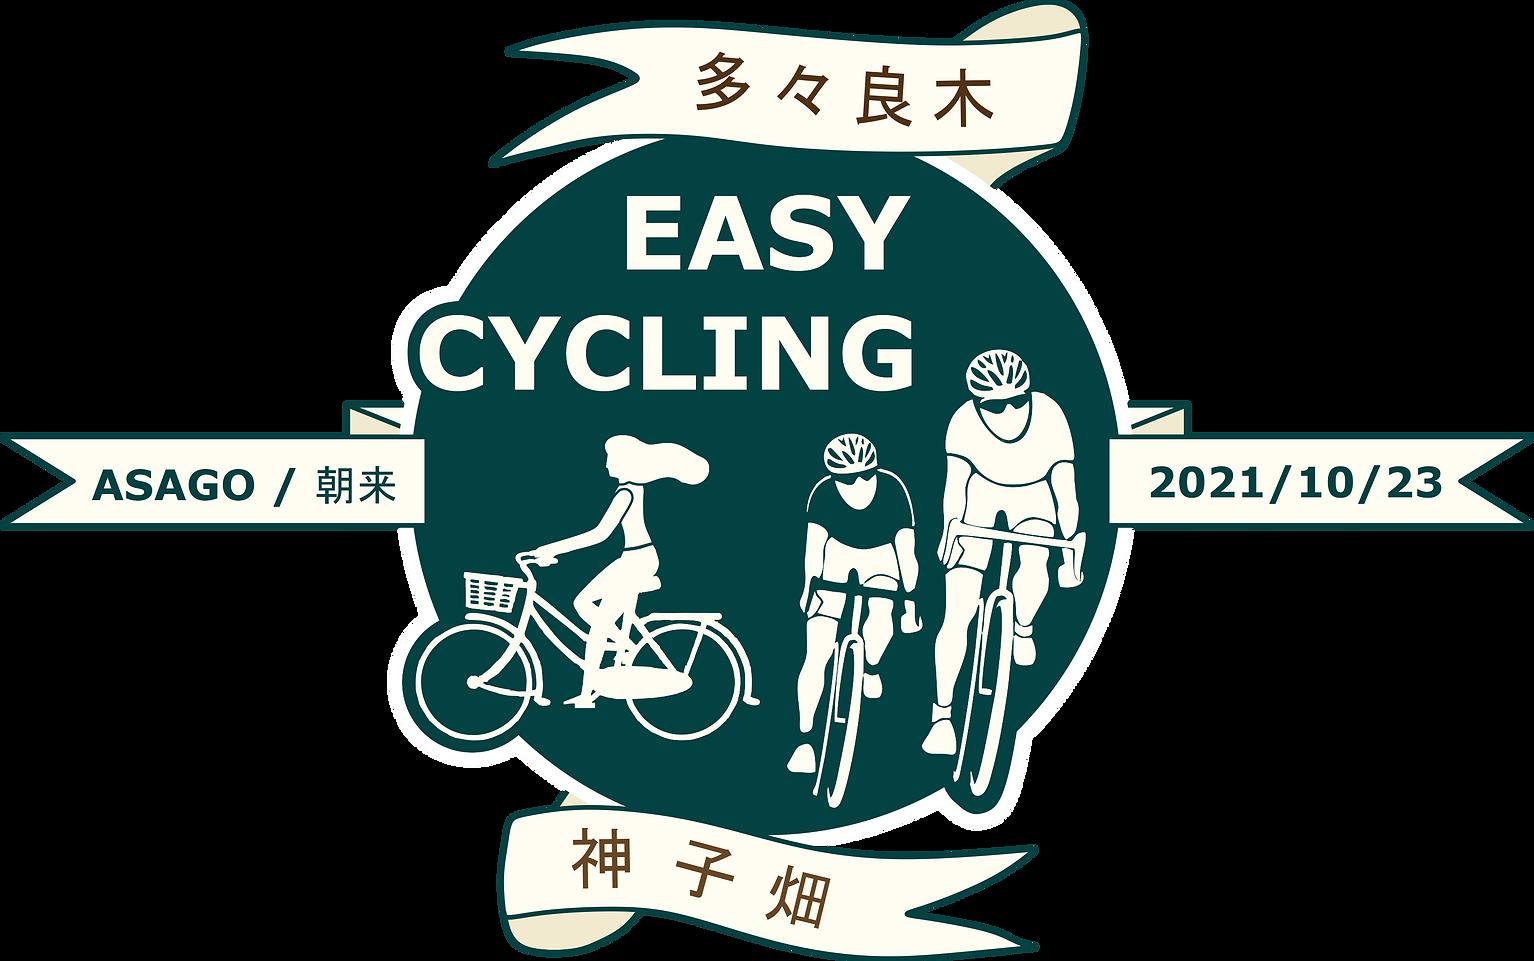 Logo Revised Dates.png